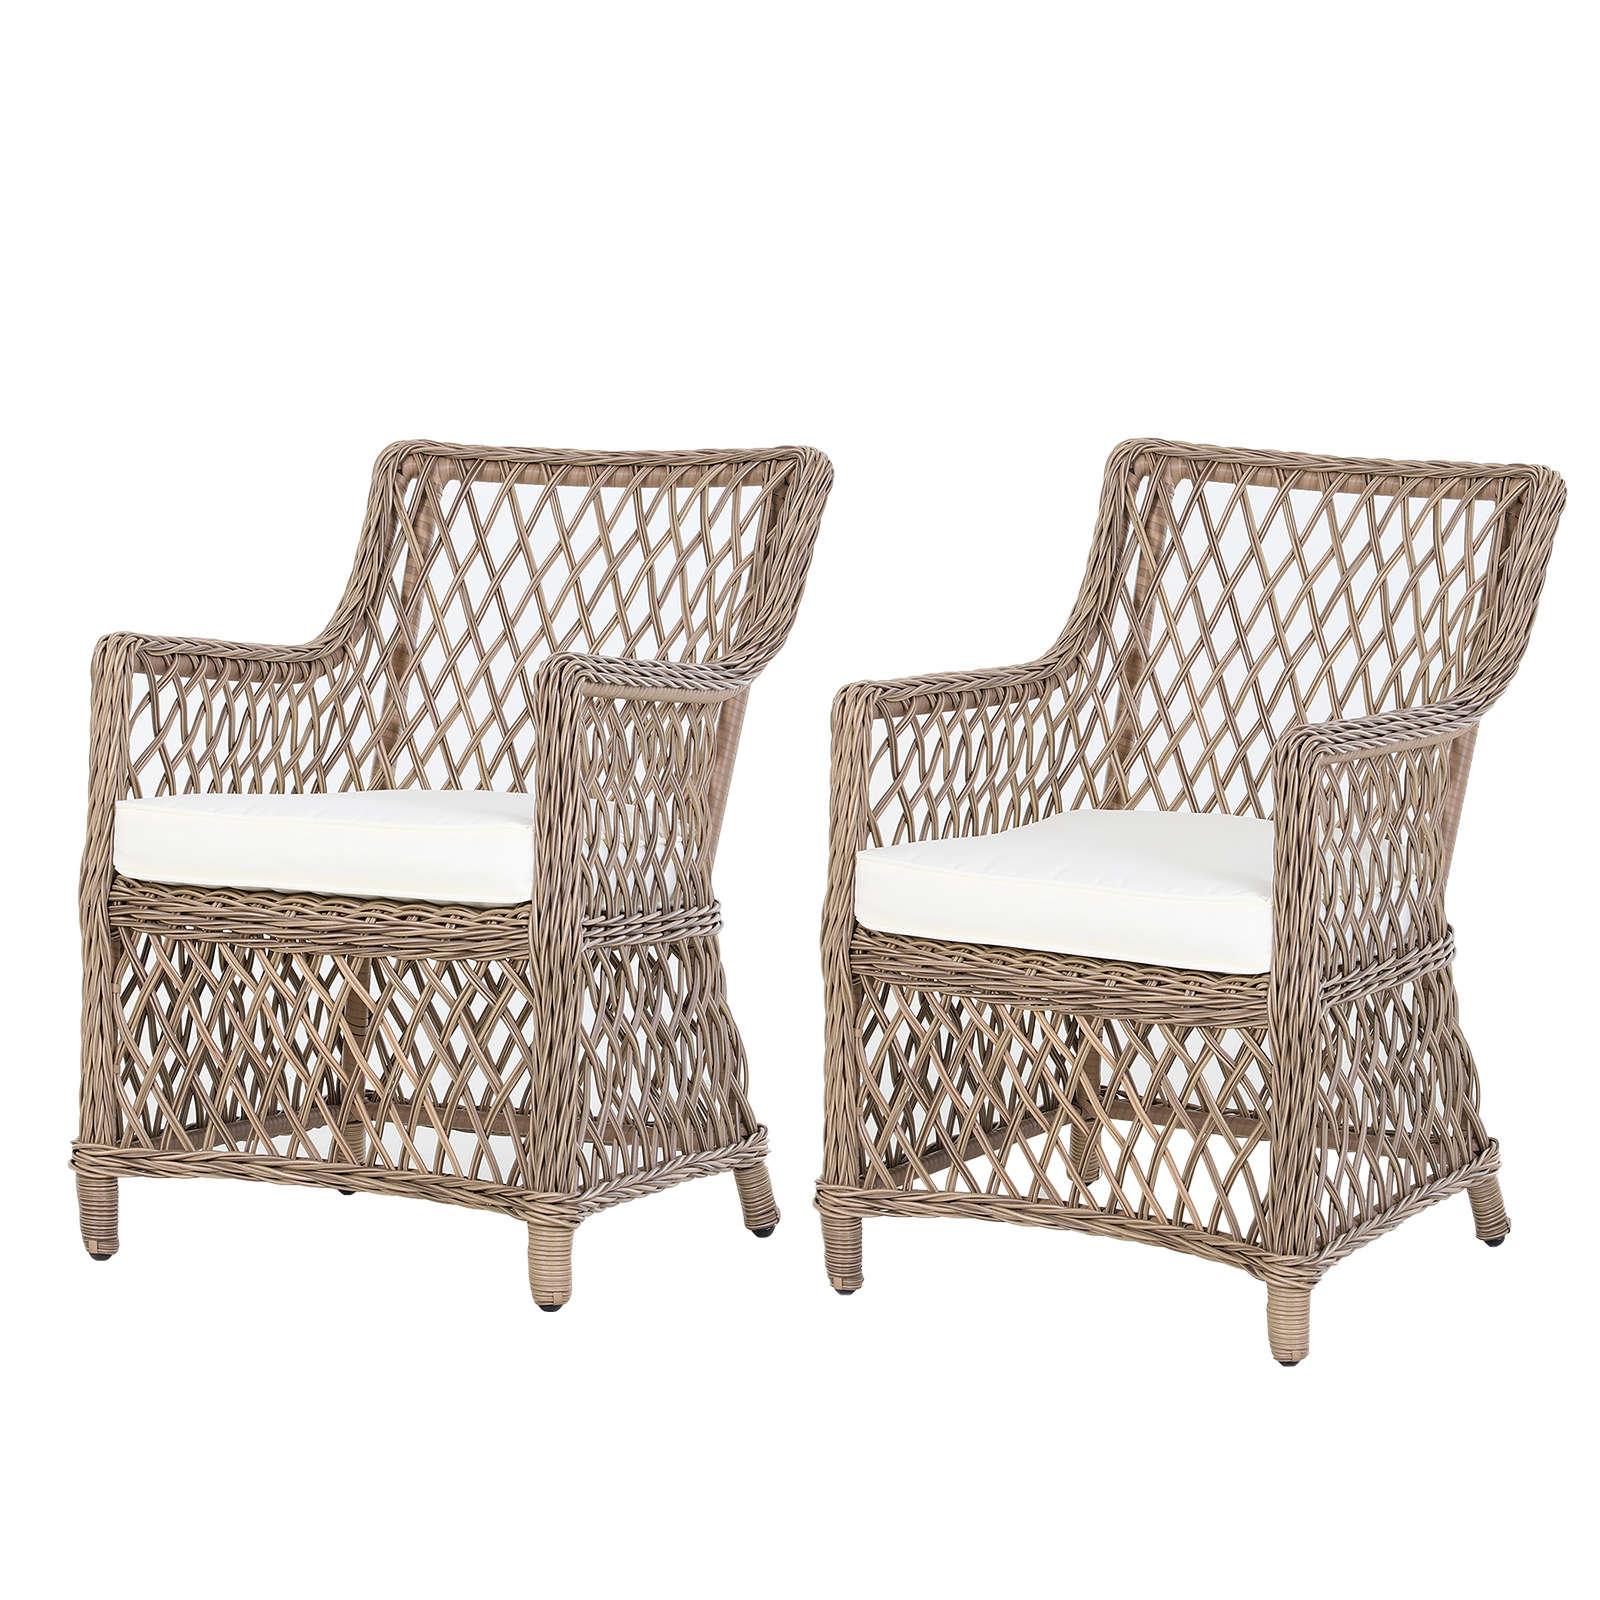 Lot De 2 Fauteuils Lounge De Jardin Style Cosy concernant Fauteuil De Jardin En Bois Style Americain